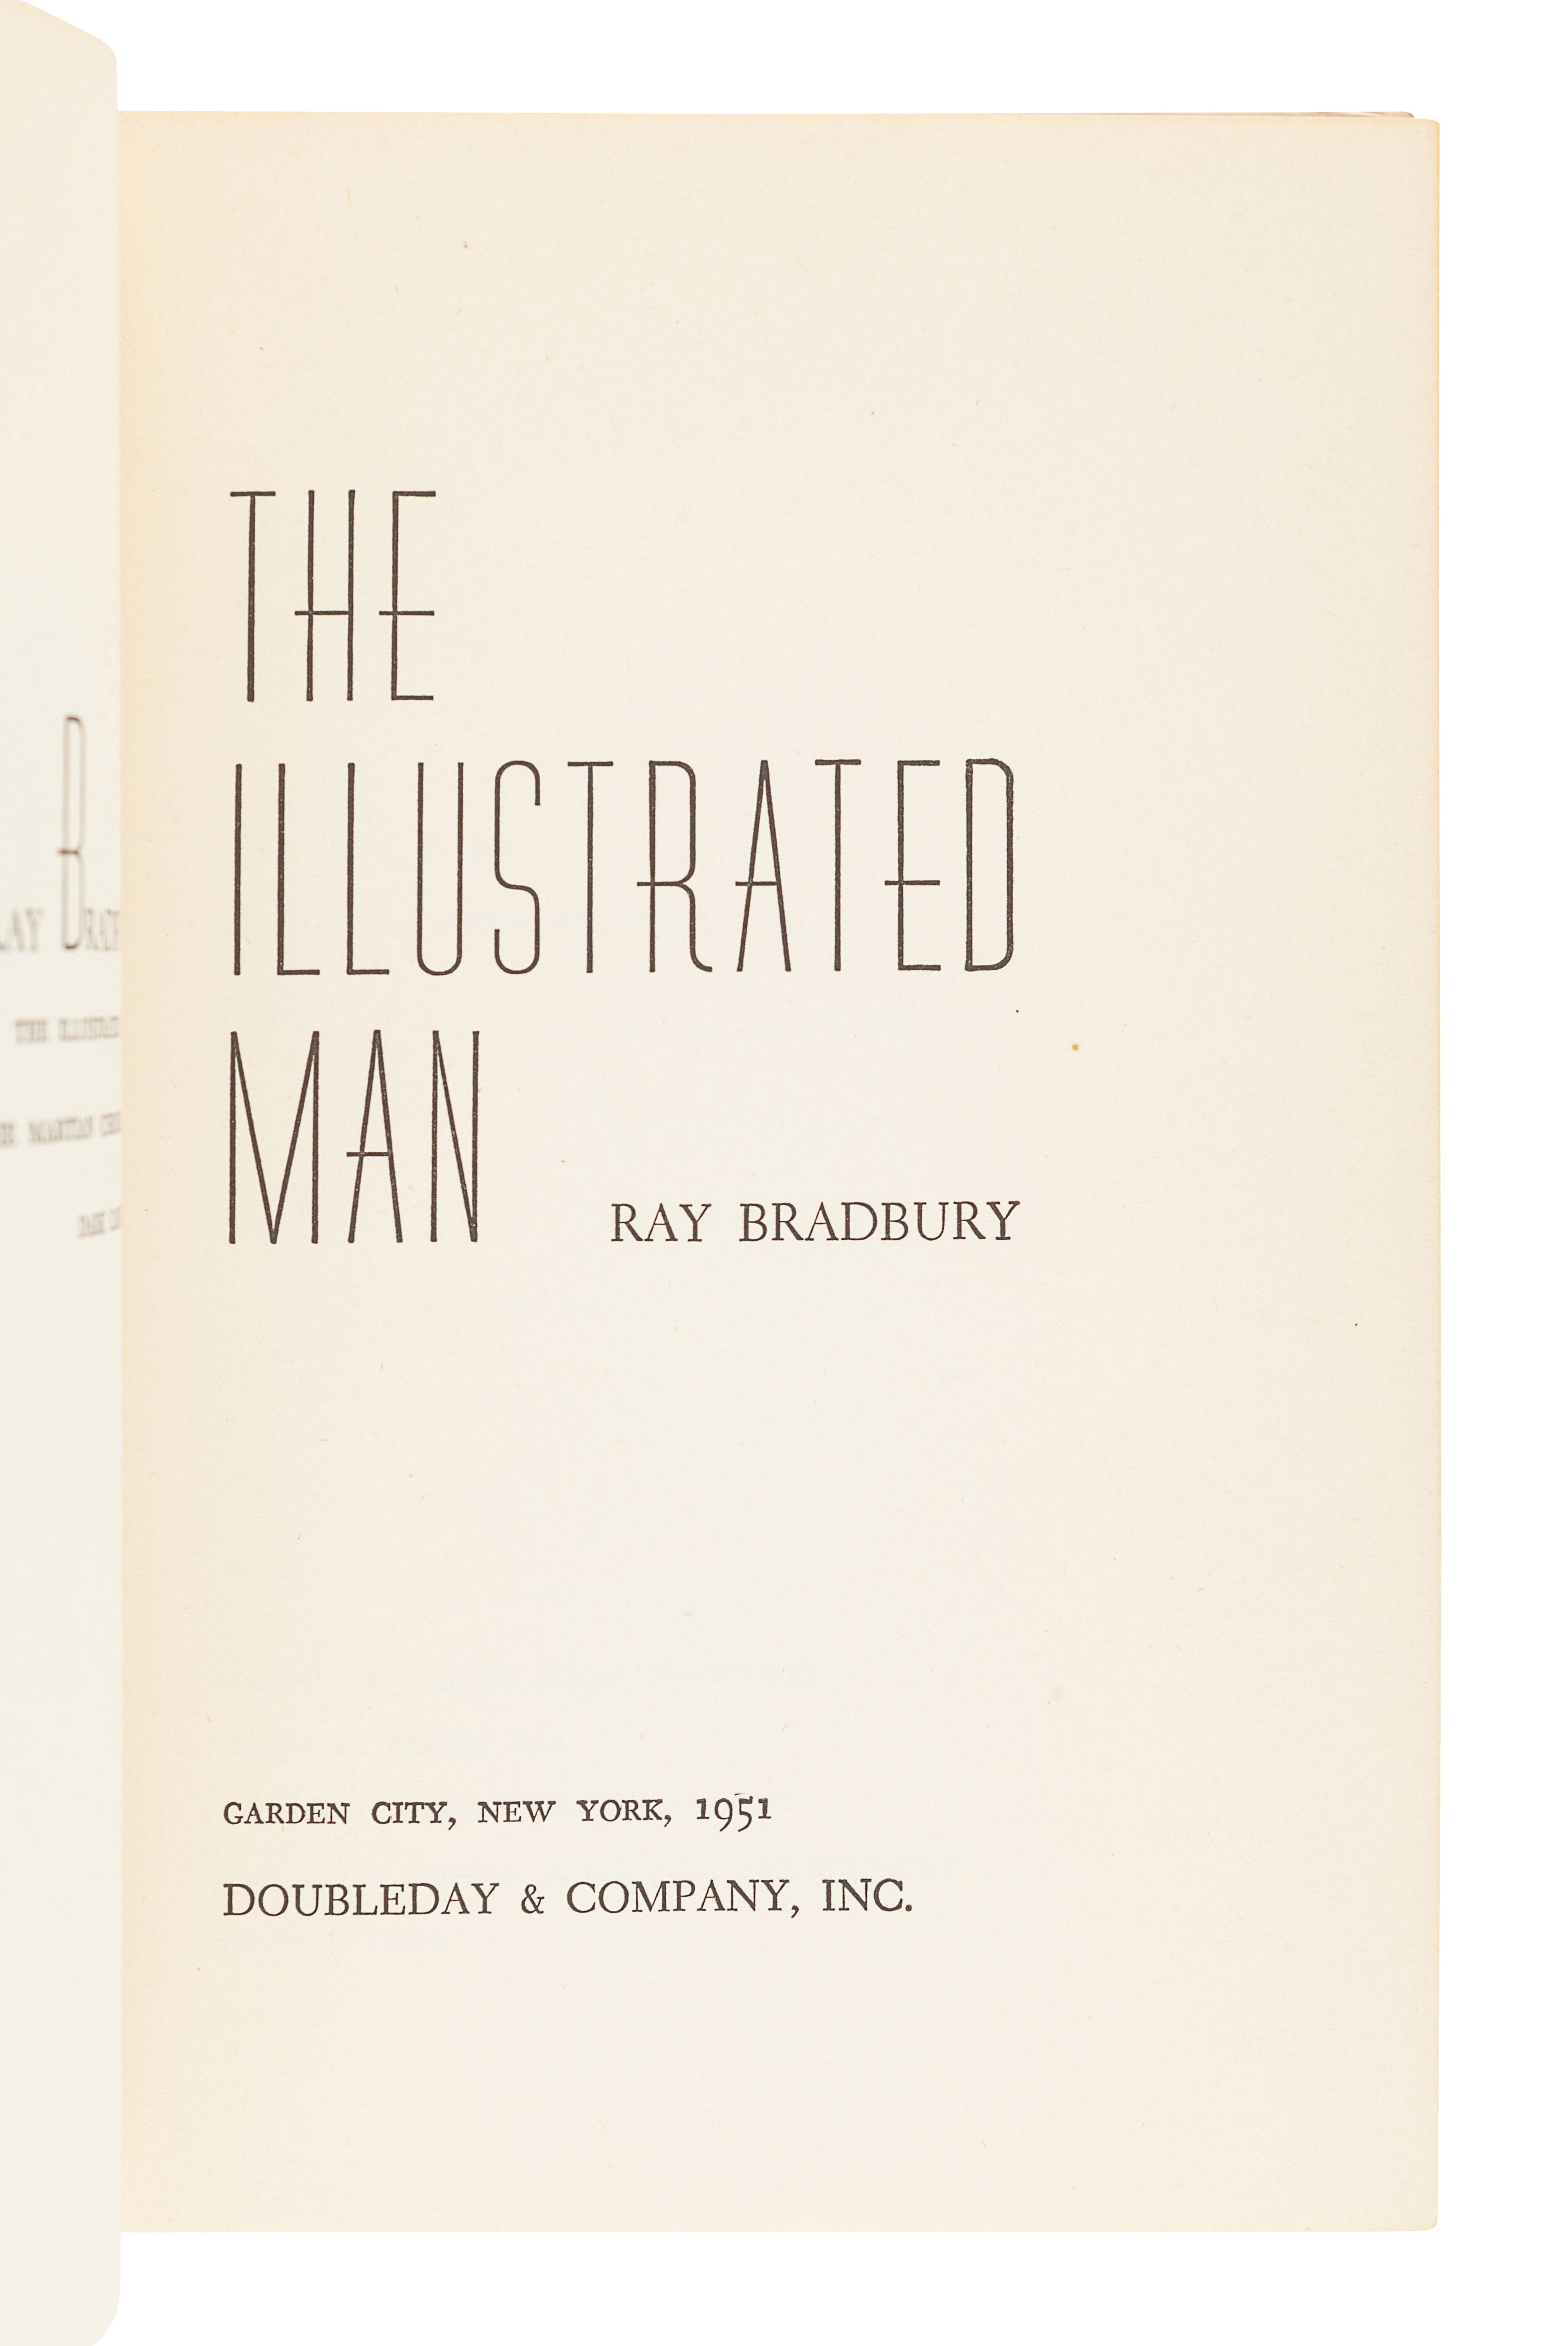 BRADBURY, Ray (1920-2012). The Illustrated Man. Garden City: Doubleday & Company, Inc., 1951. - Image 4 of 5